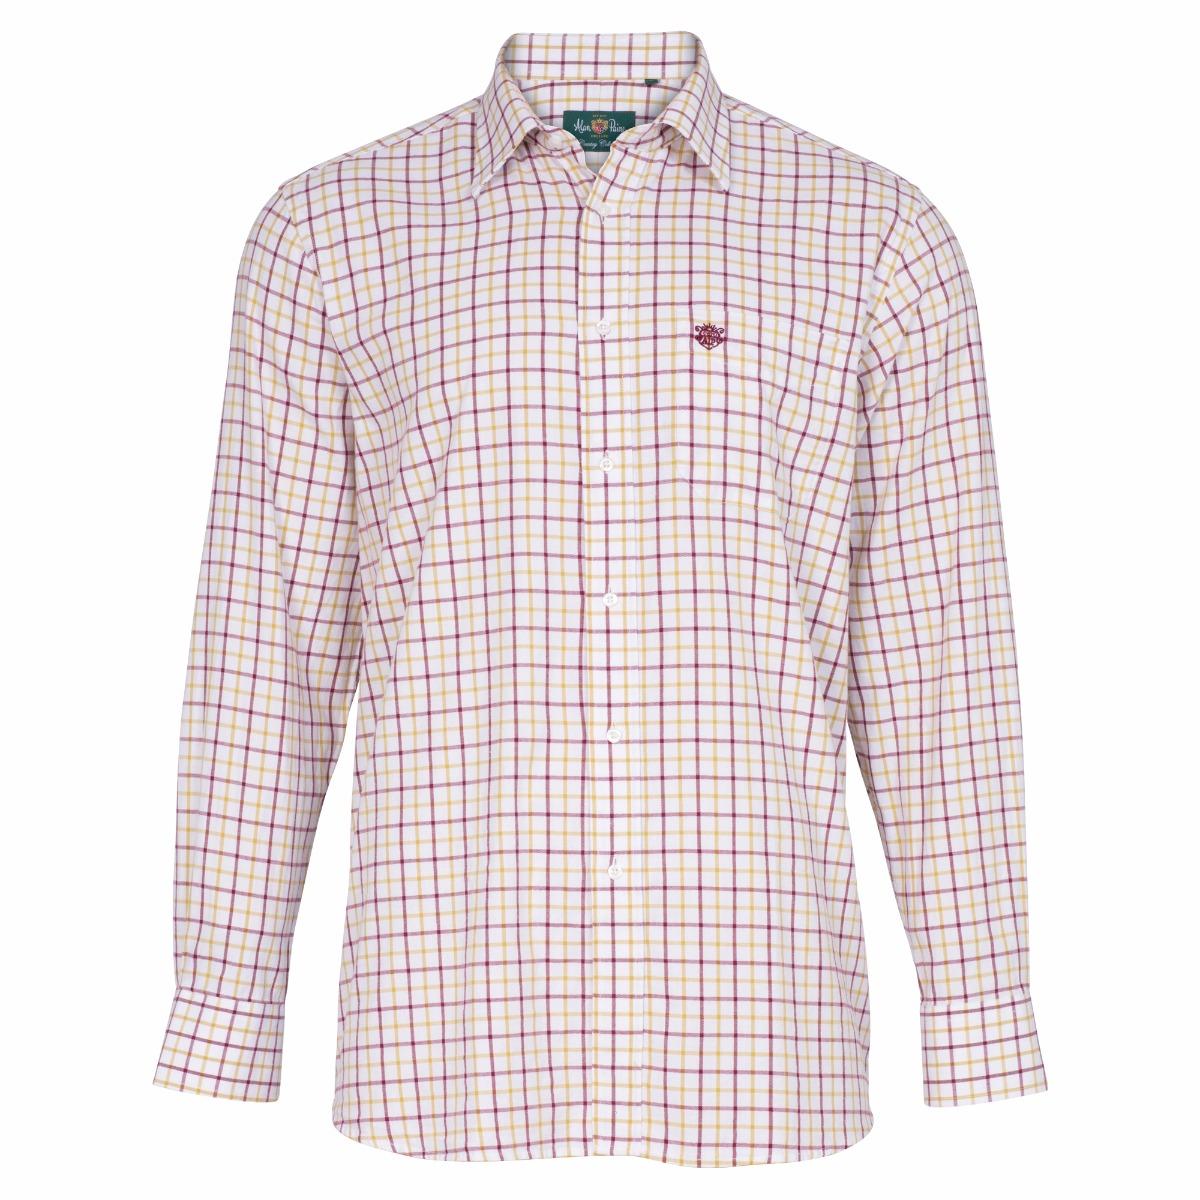 9873dc3fb5ee1 alan paine ilkley men s shirt in bordeaux chk26.jpg